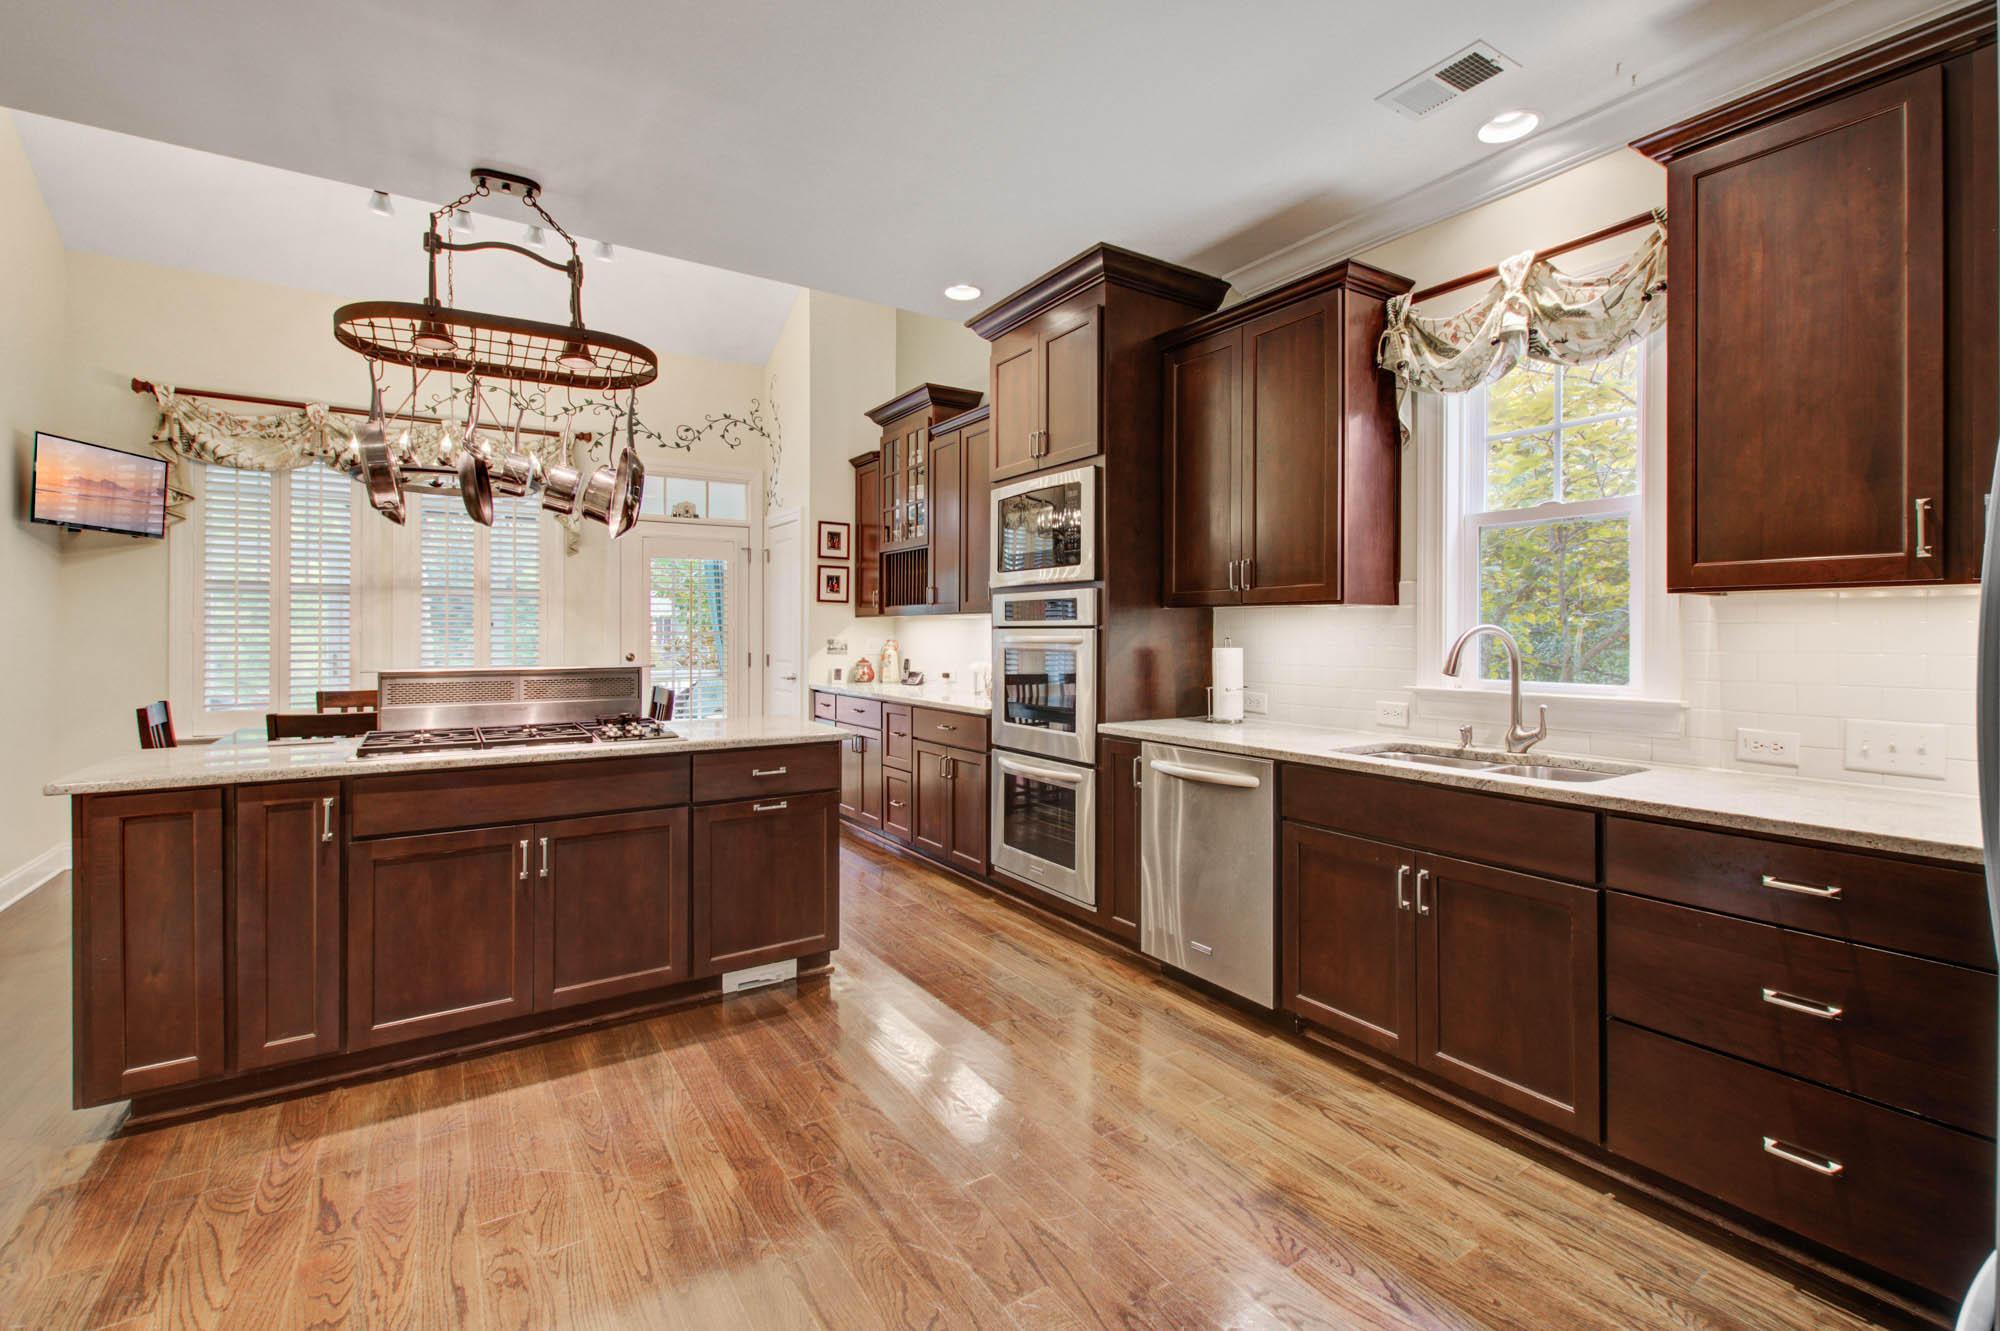 Hamlin Plantation Homes For Sale - 2840 Treadwell, Mount Pleasant, SC - 17